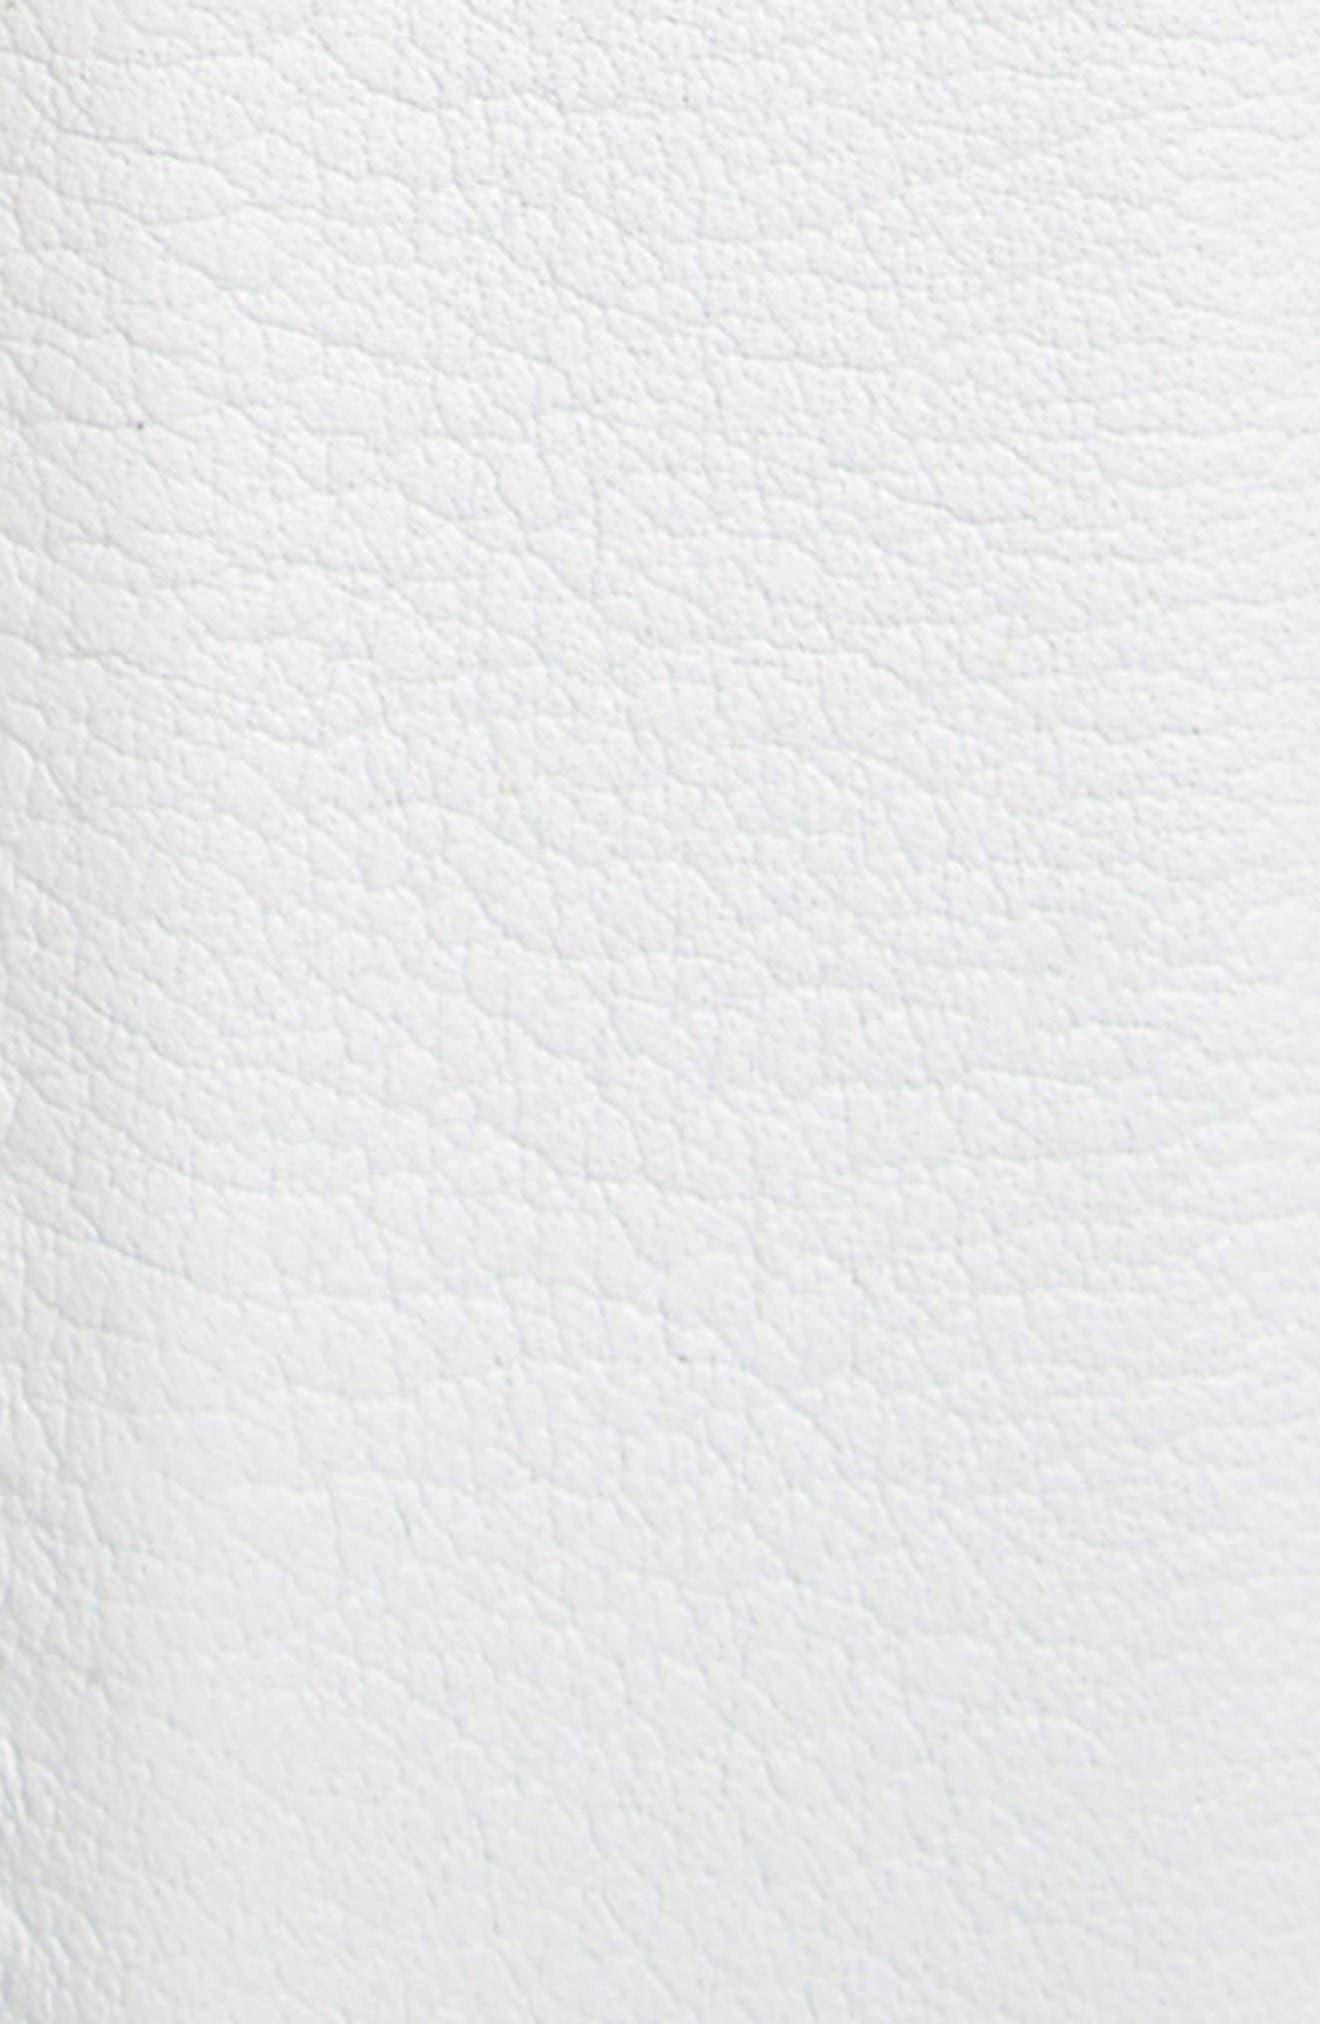 Rugo Leather Belt,                             Alternate thumbnail 2, color,                             White